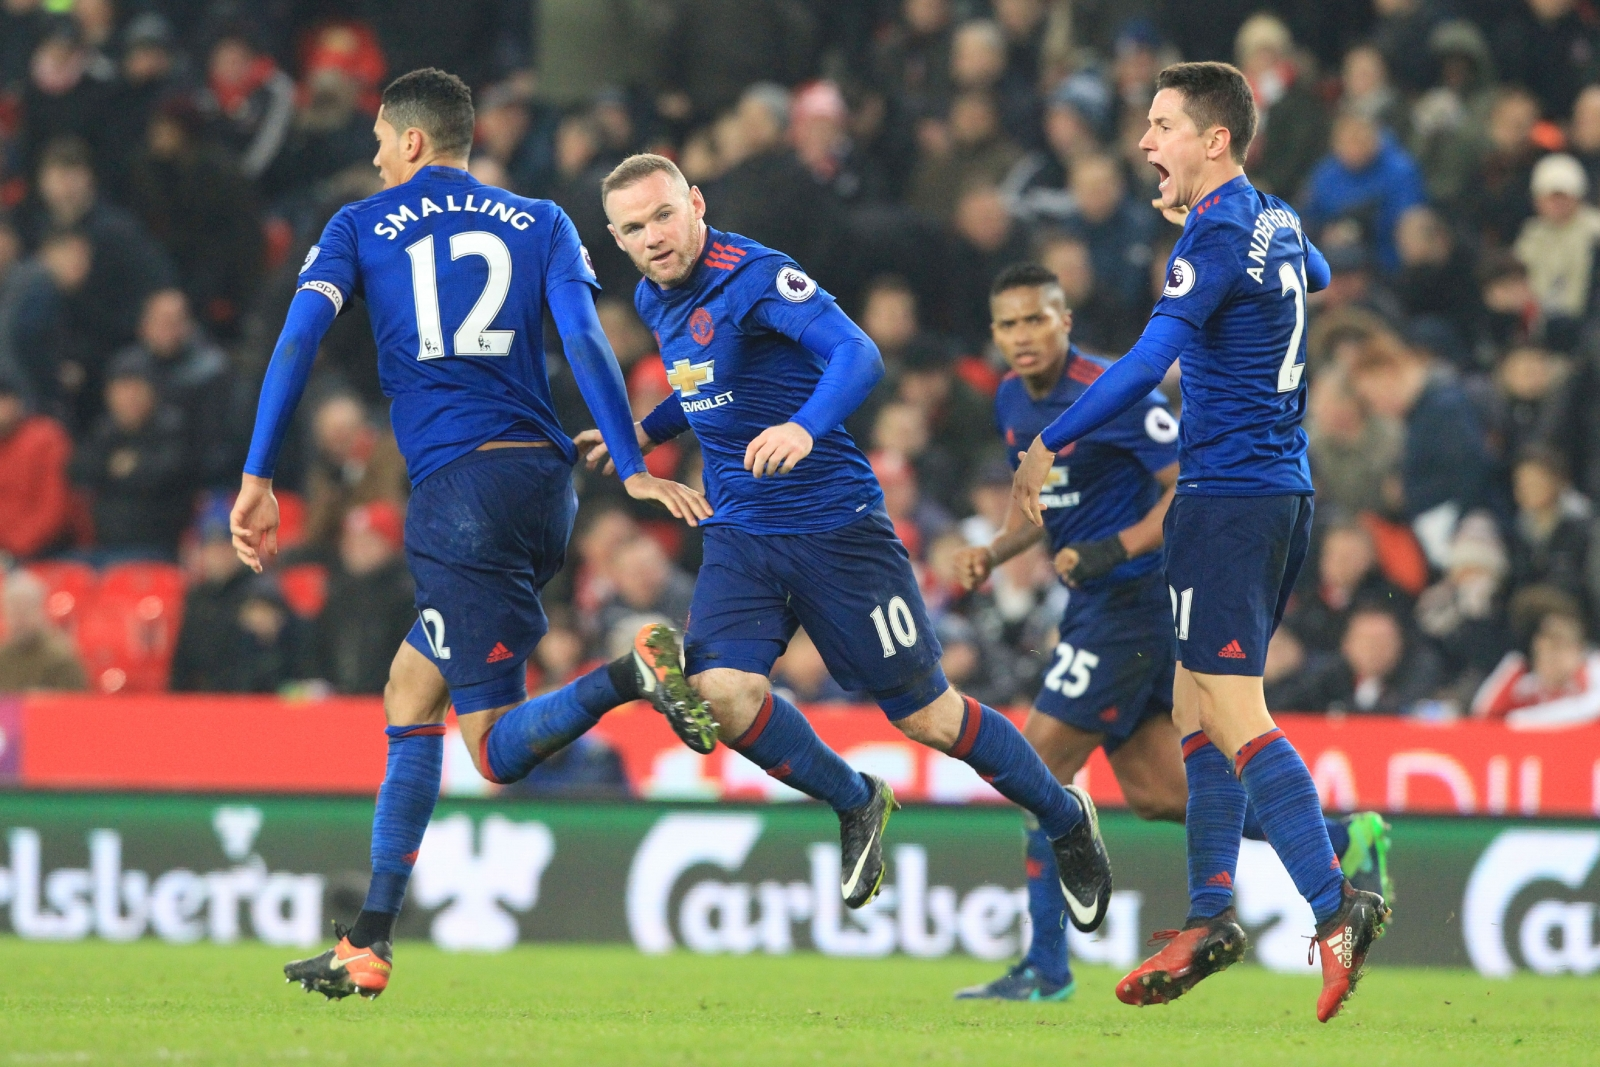 (Football) Carrick says Man Utd will go for it at Hull